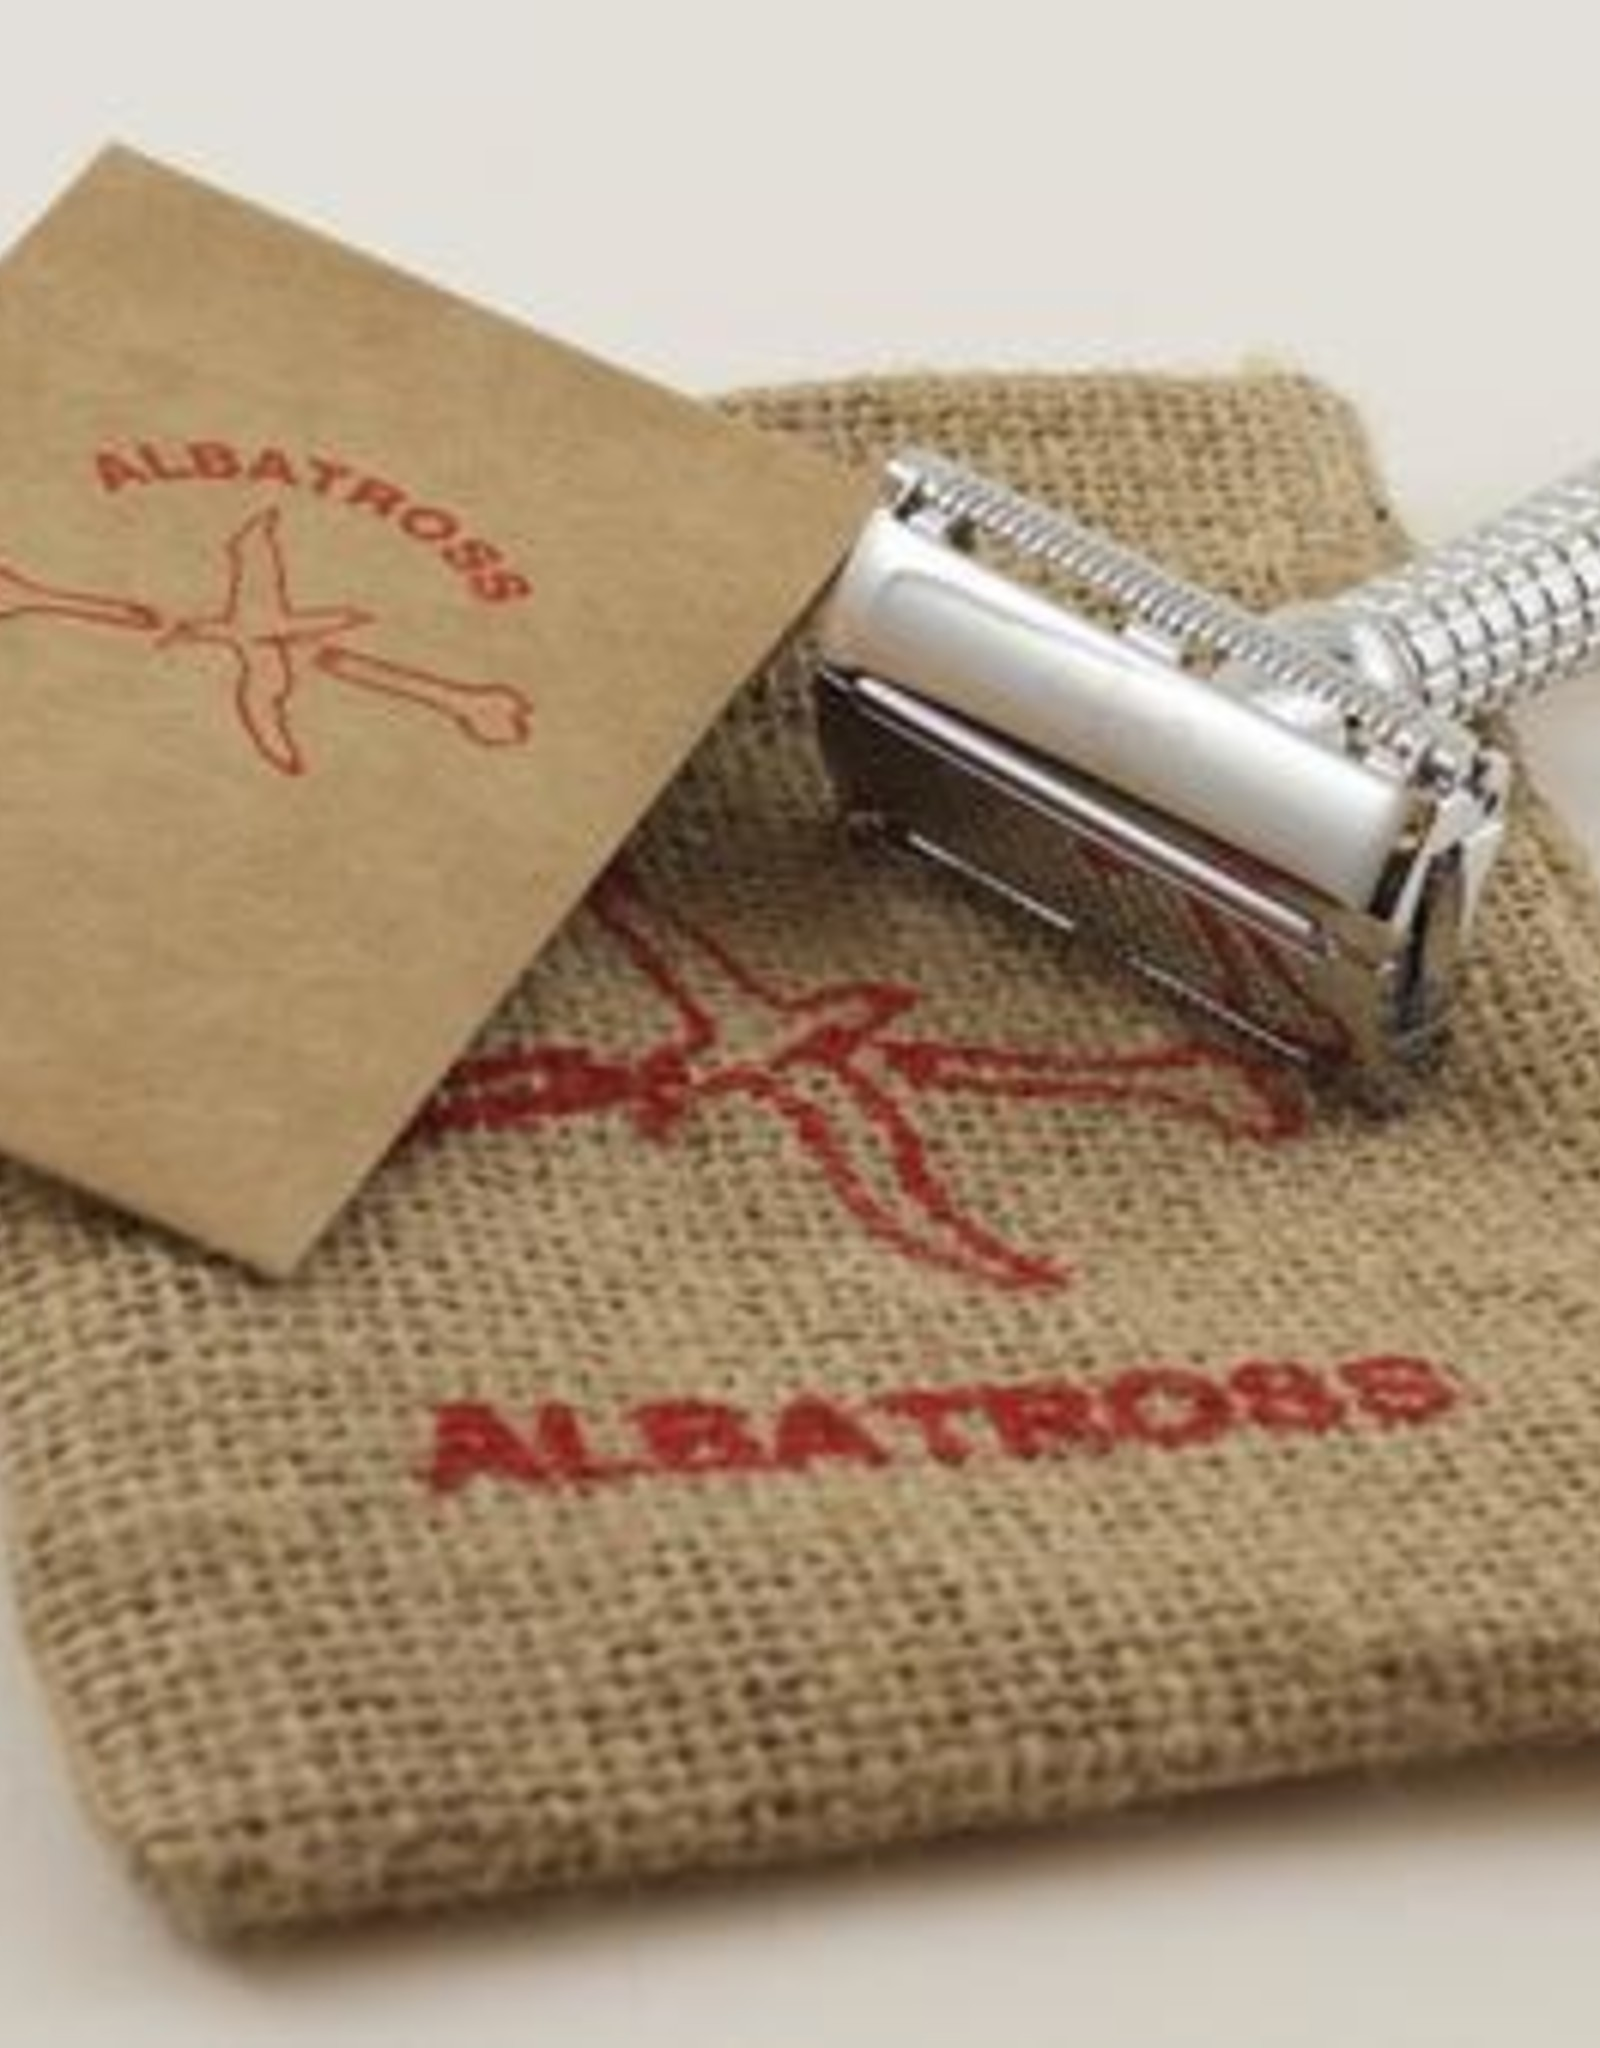 Albatross Extra Long Safety Razor- Butterfly